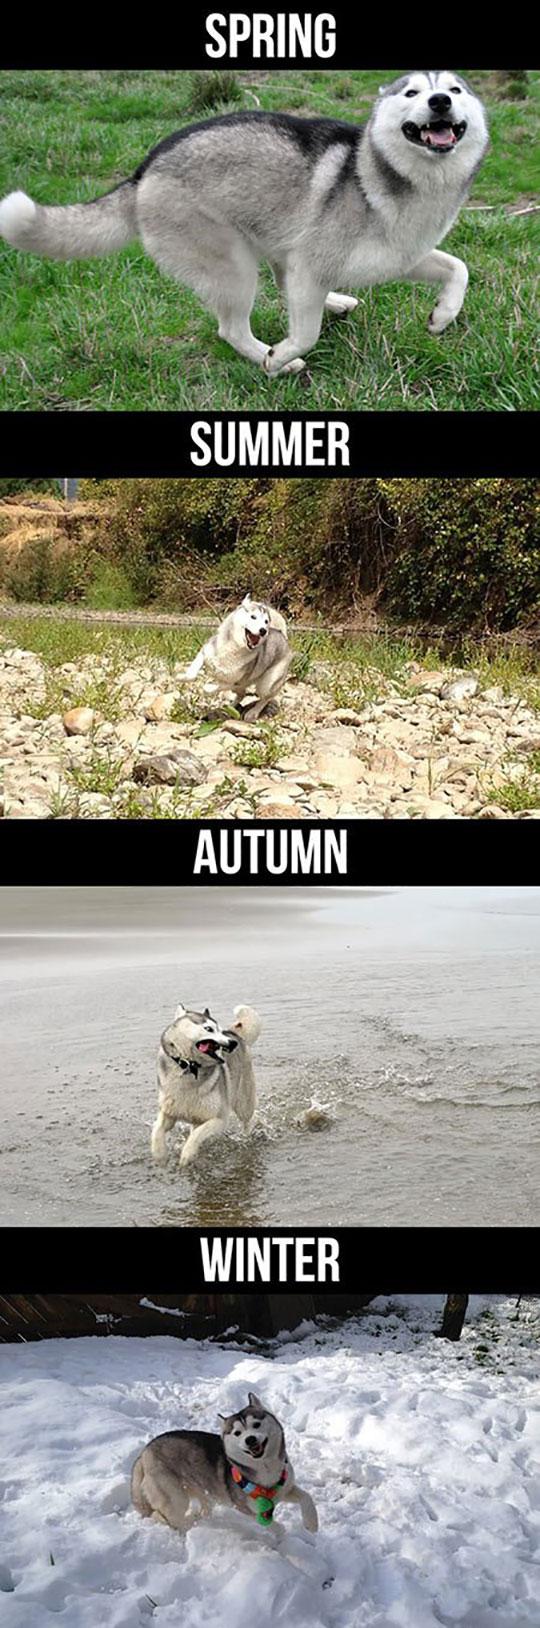 cool-husky-playing-seasons-winter